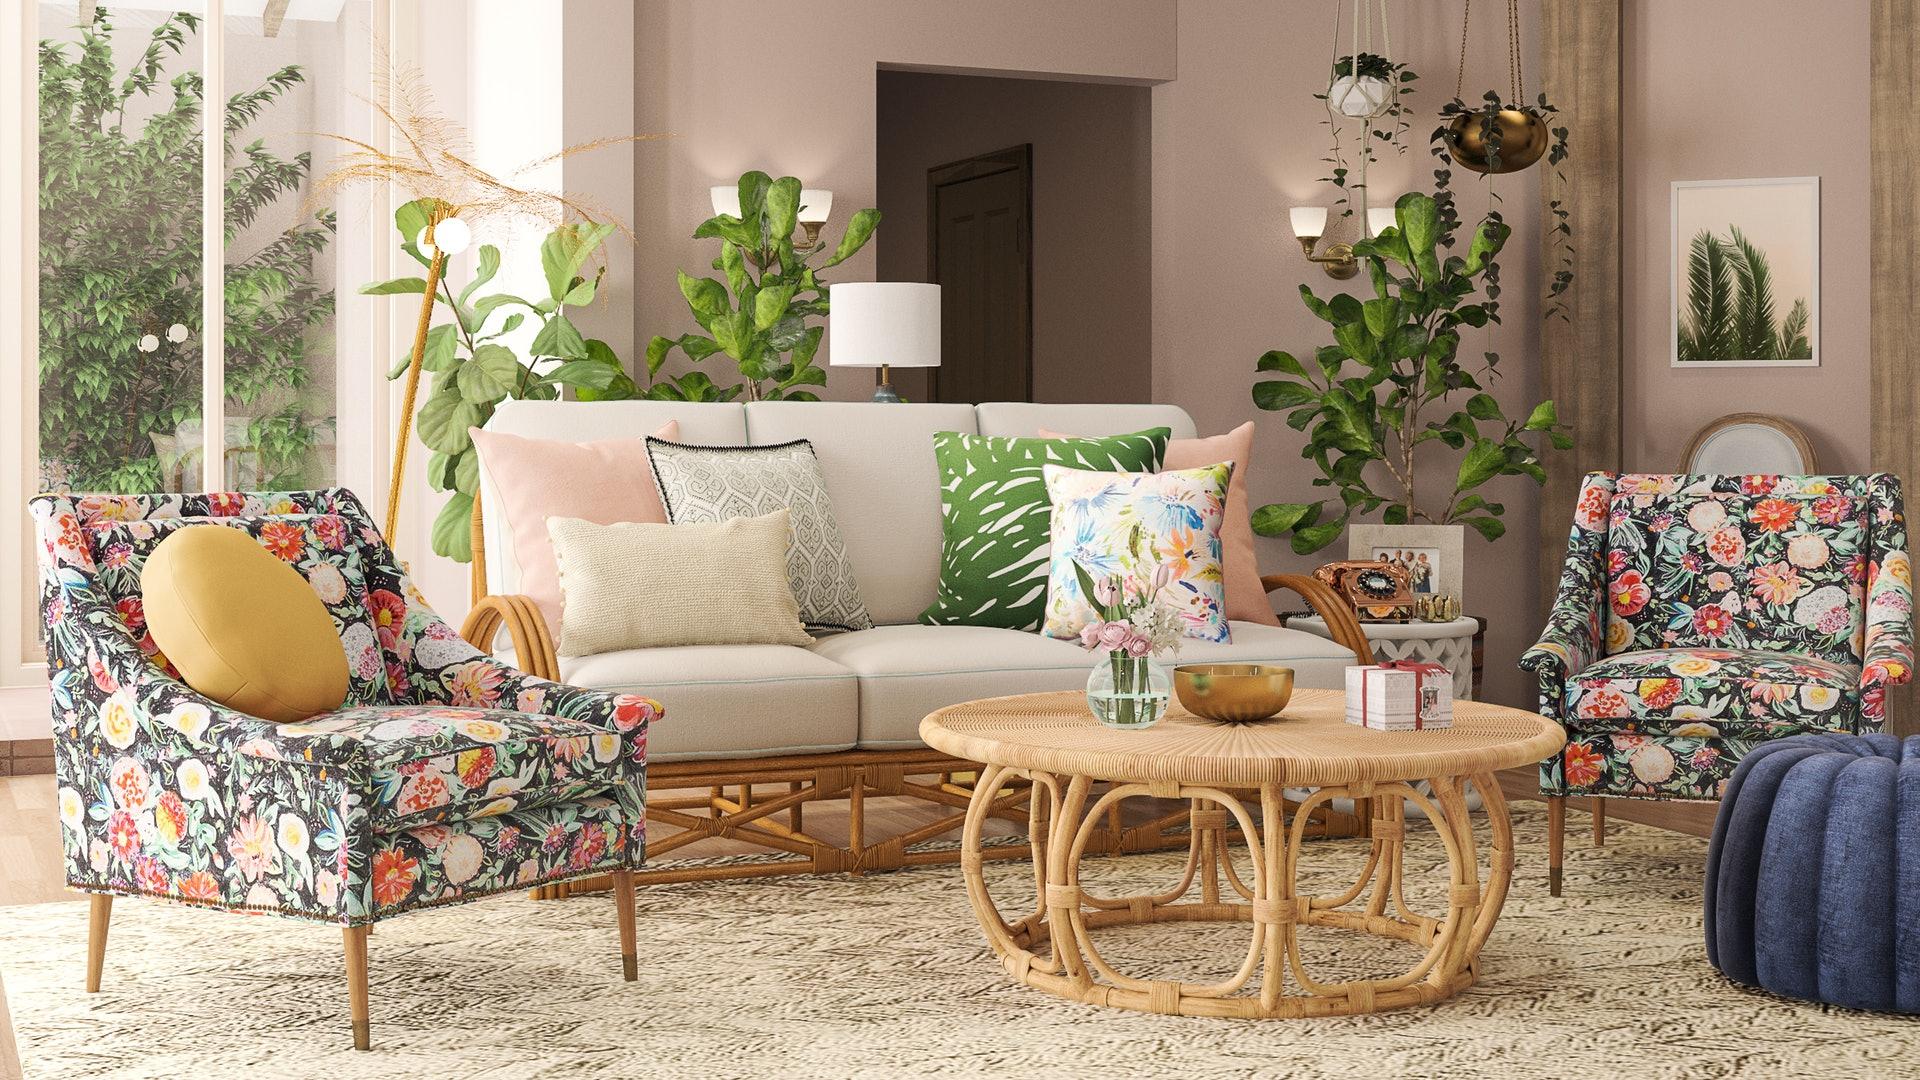 the Golden Girls' living room in the app's background